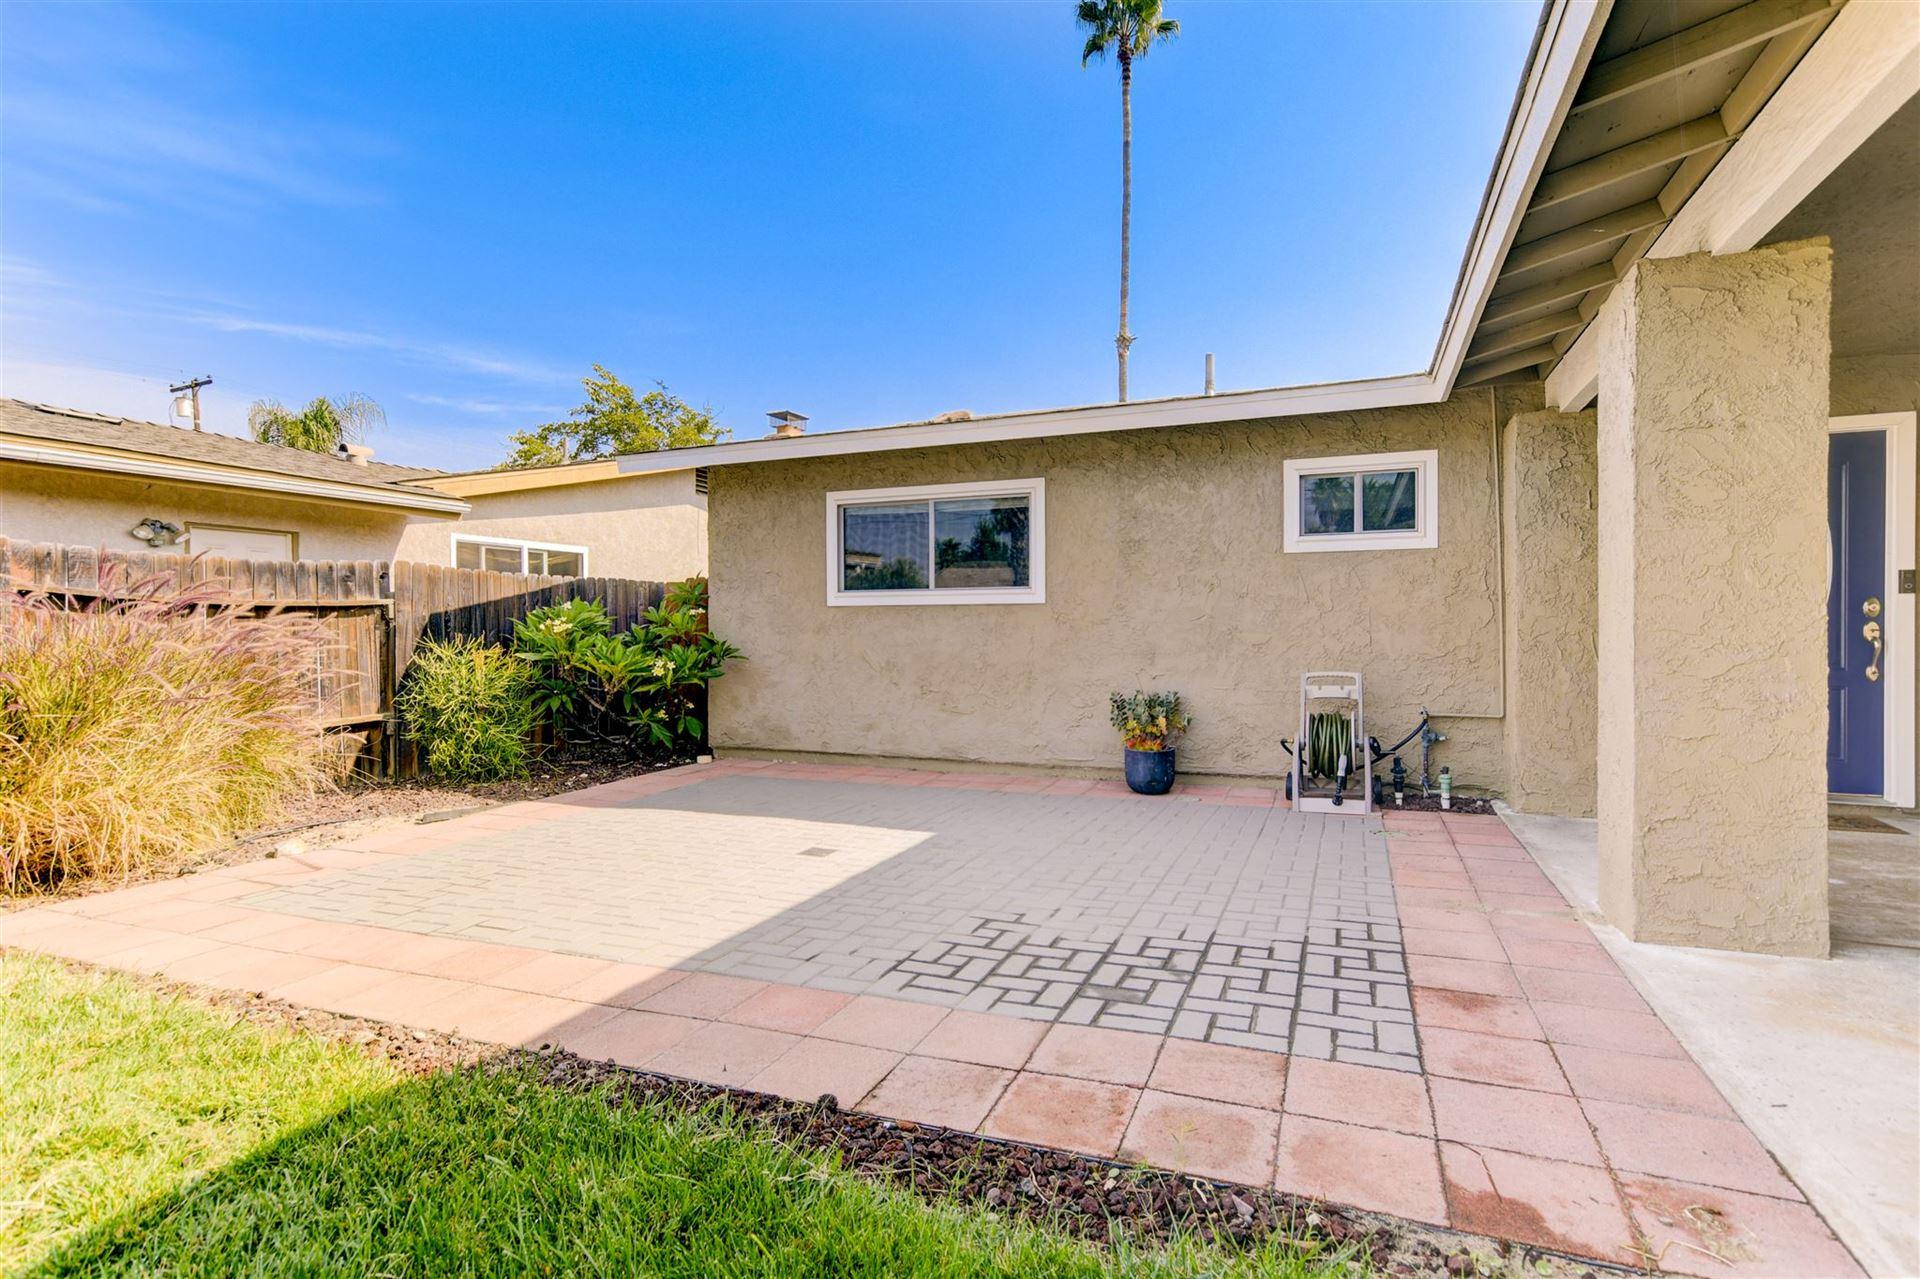 Photo of 610 Judson St, Escondido, CA 92027 (MLS # 200045741)